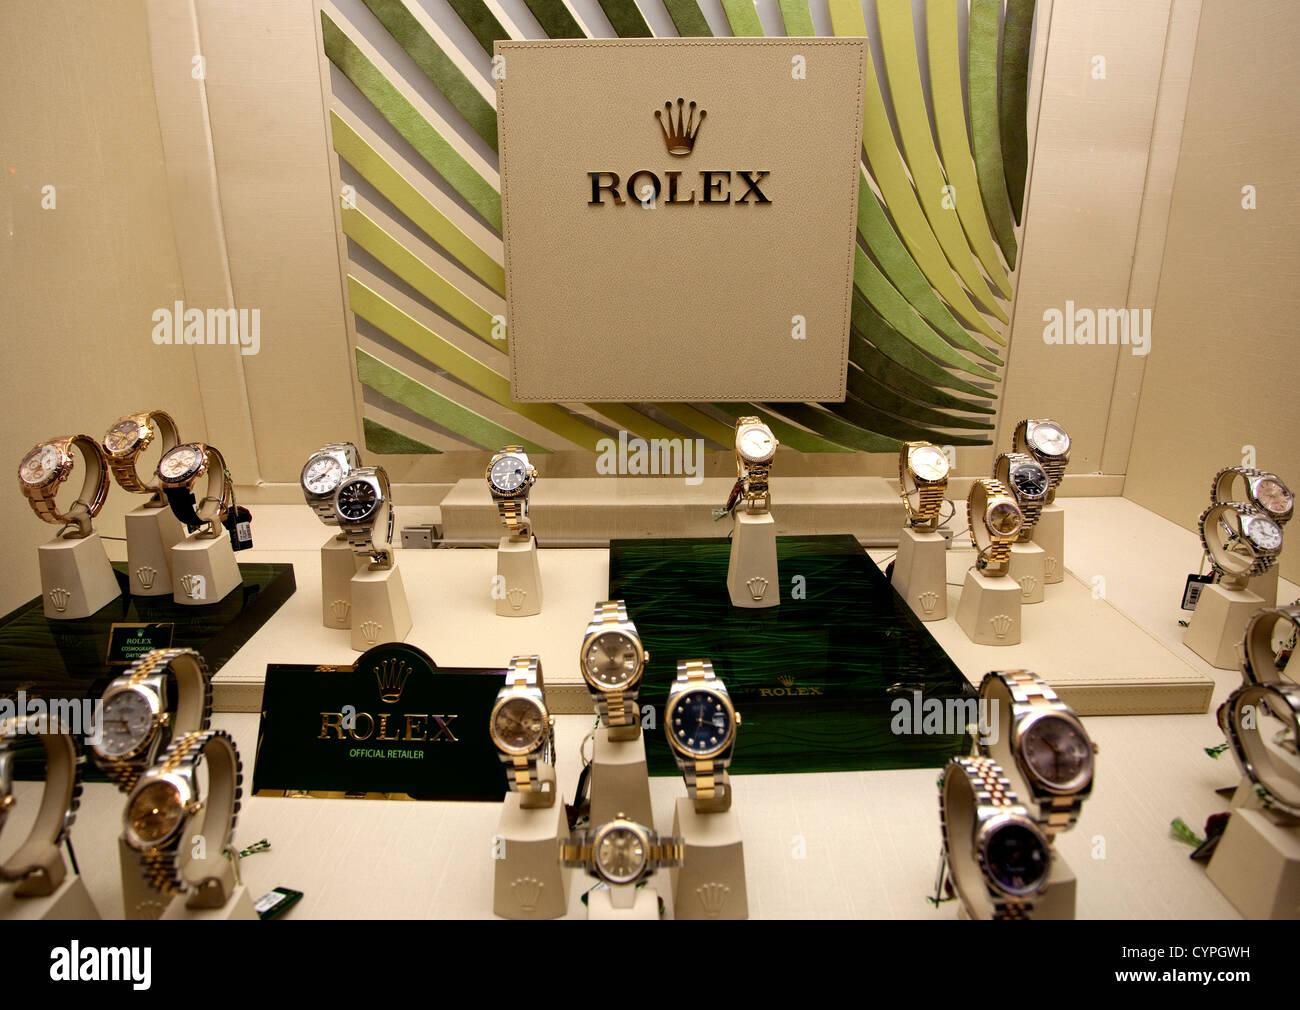 London shop window display of luxury Rolex watches - Stock Image